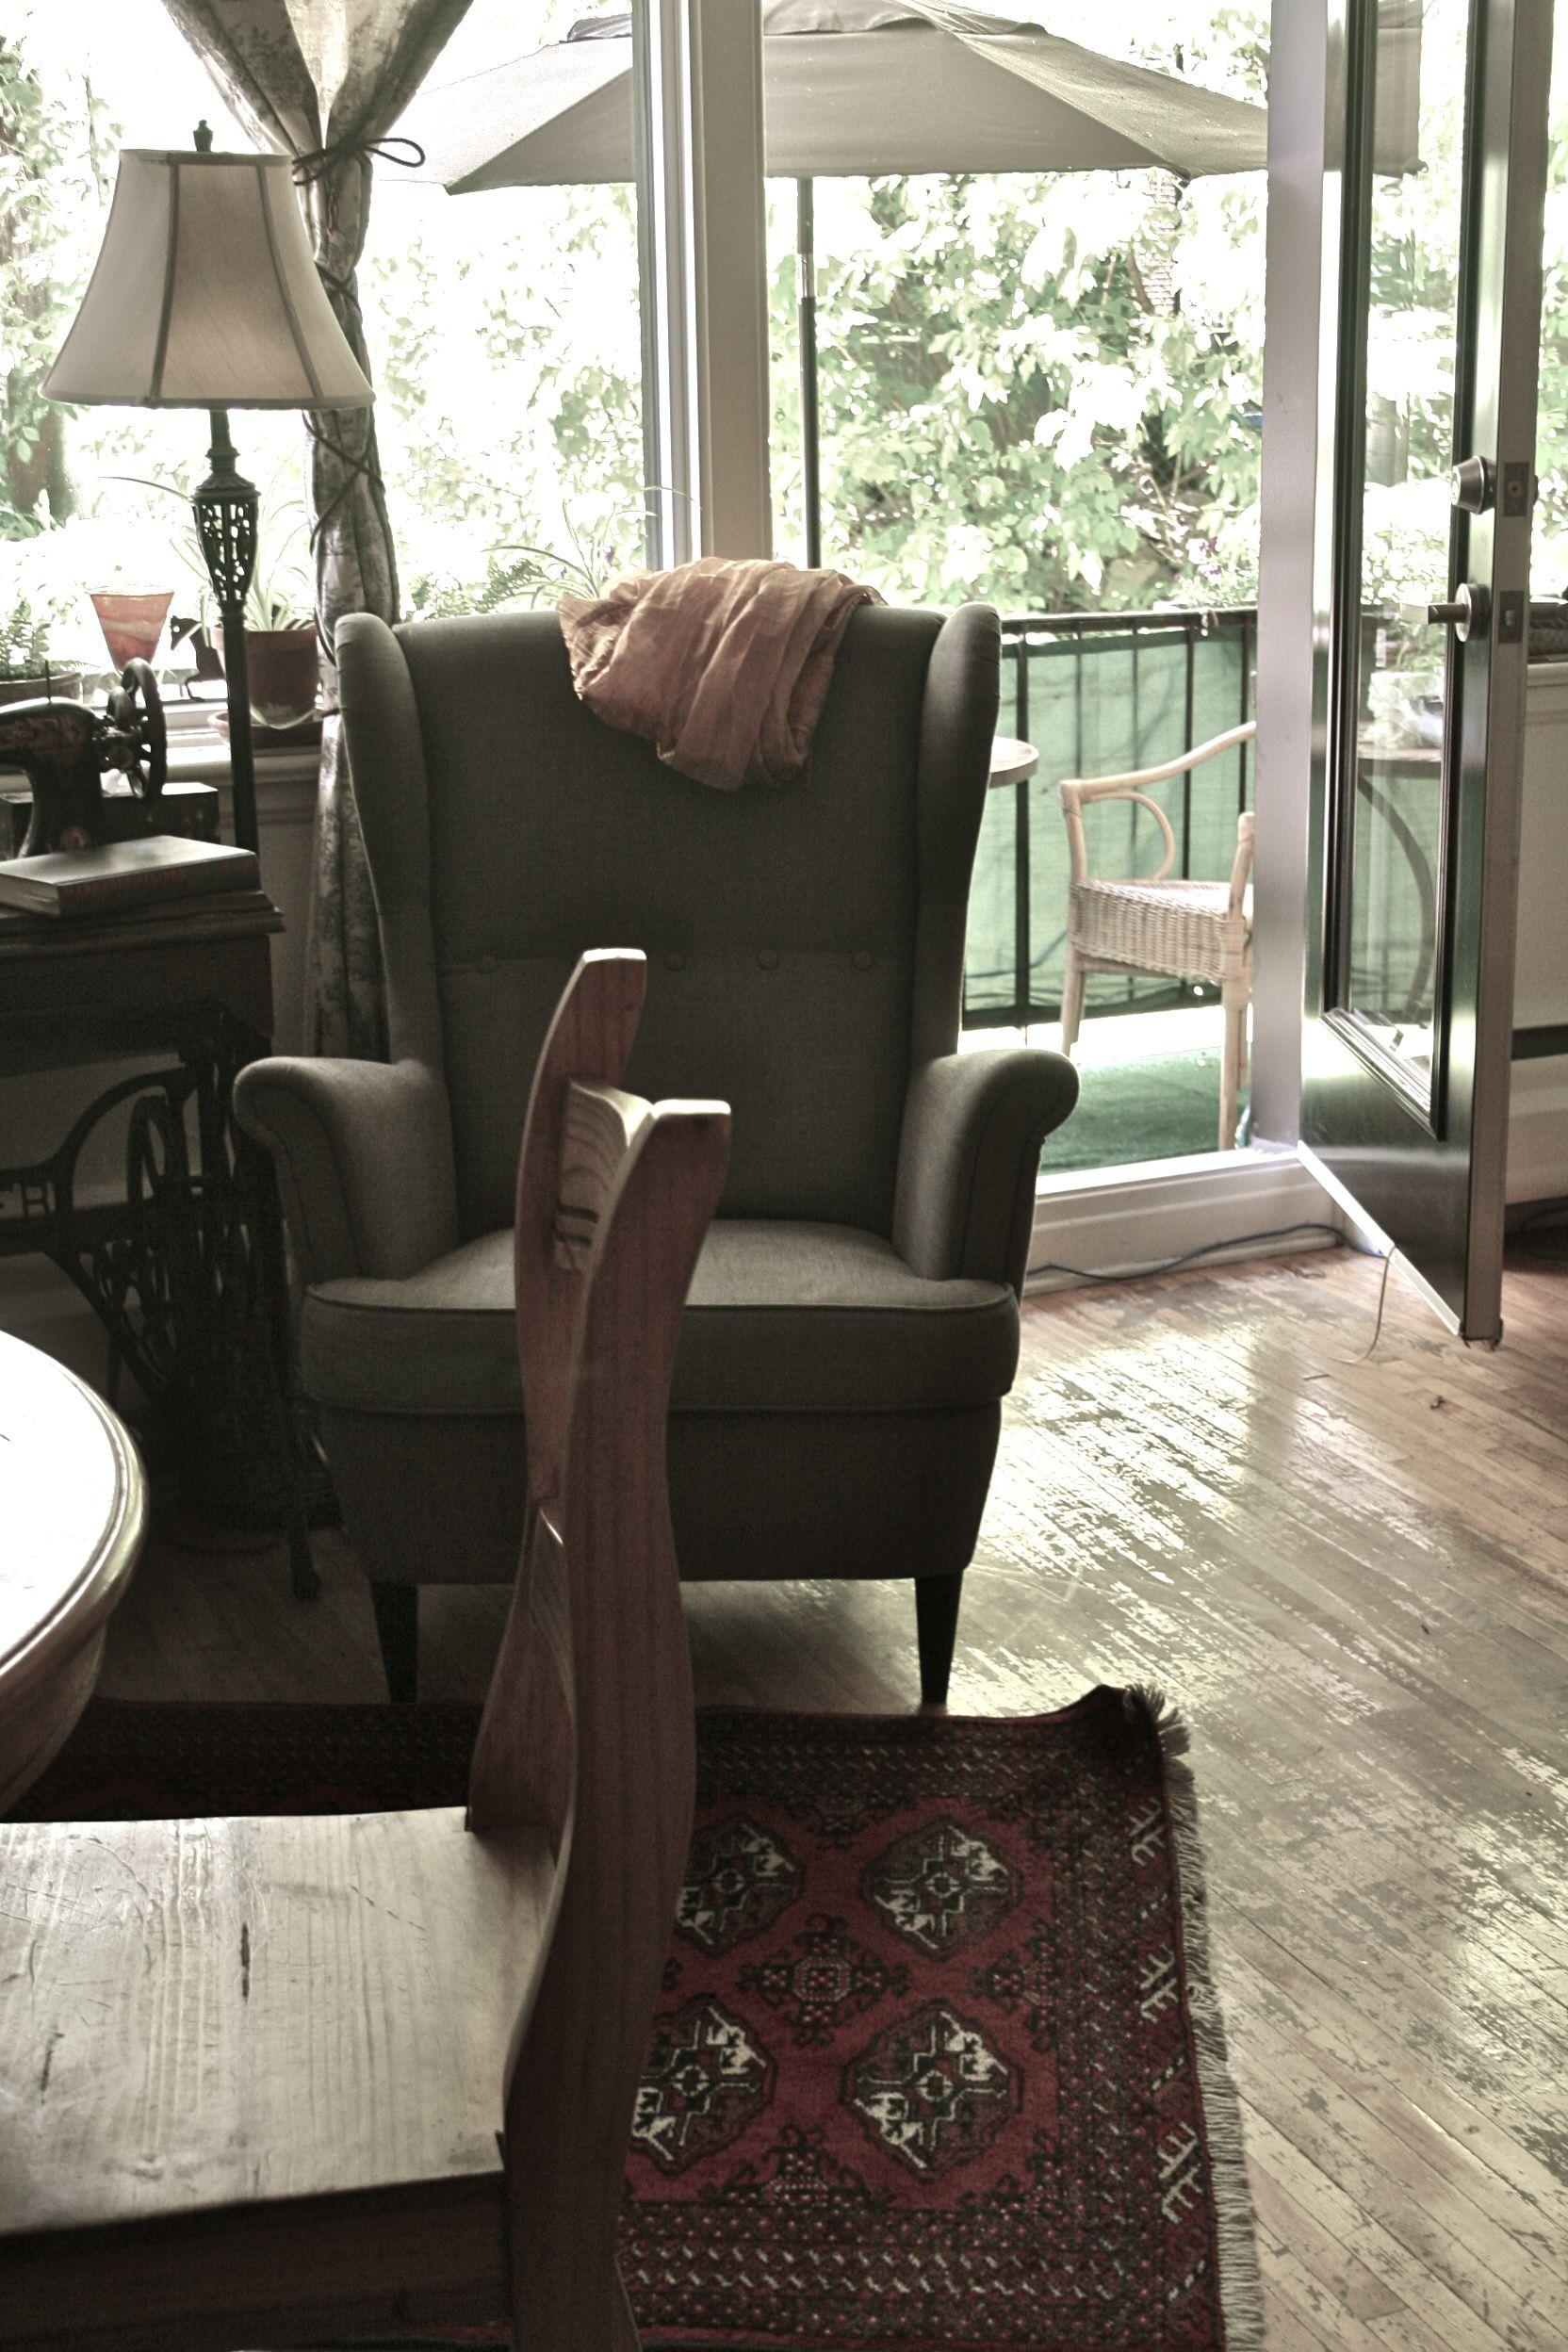 Ikea Strandmon Armchair Strandmon Chair Chair Home